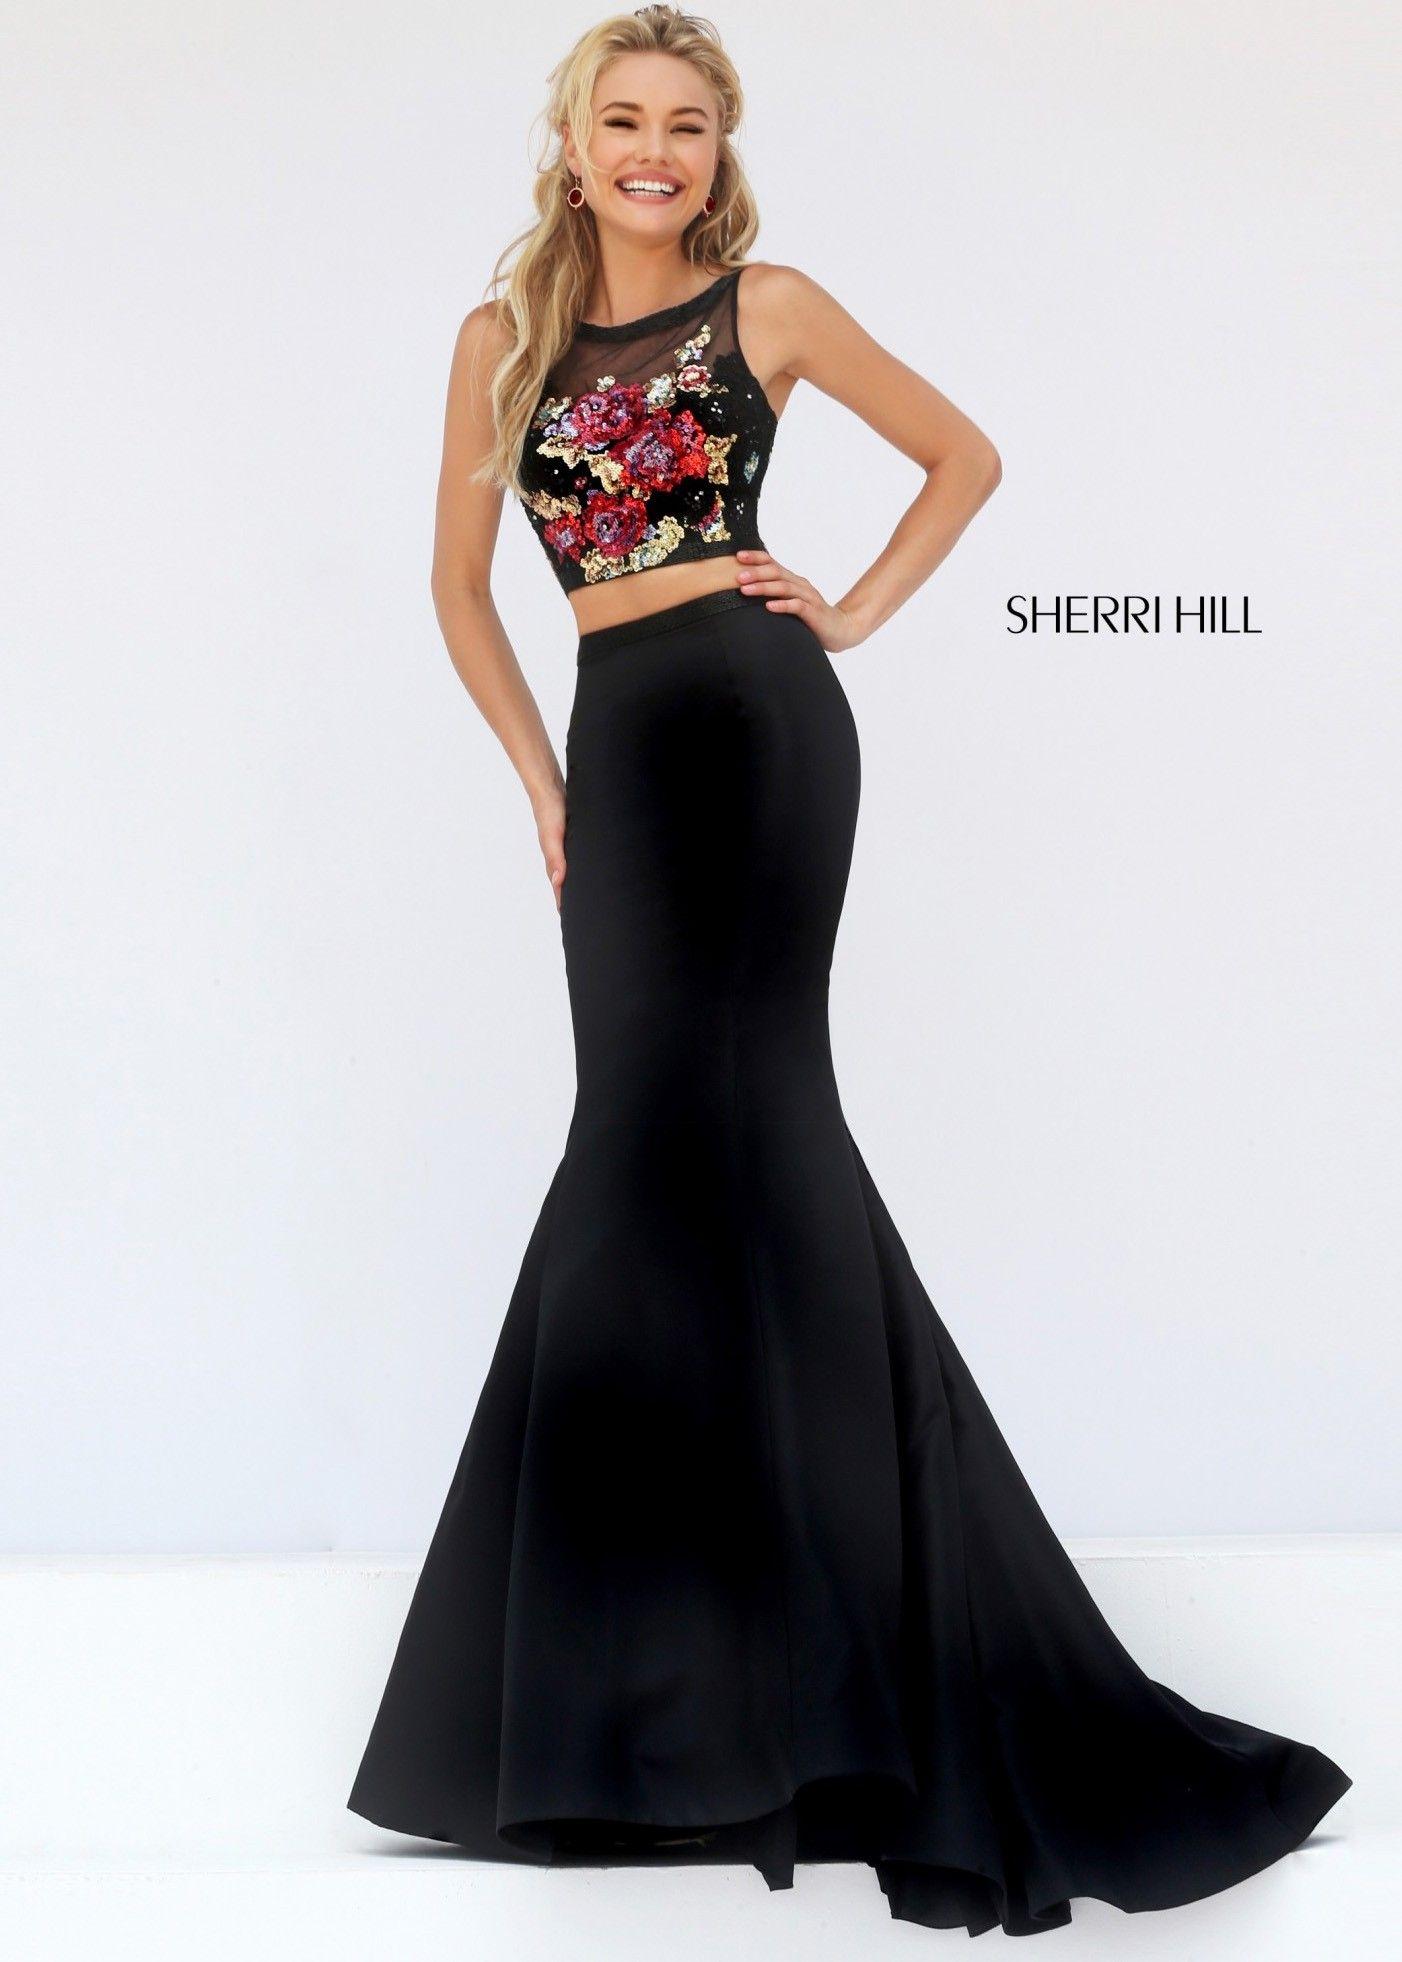 Sherri Hill 32352 Black Sequined Illusion 2 Piece Dress Homecoming Dresses Prom Dresses Designer Prom Dresses [ 1962 x 1402 Pixel ]